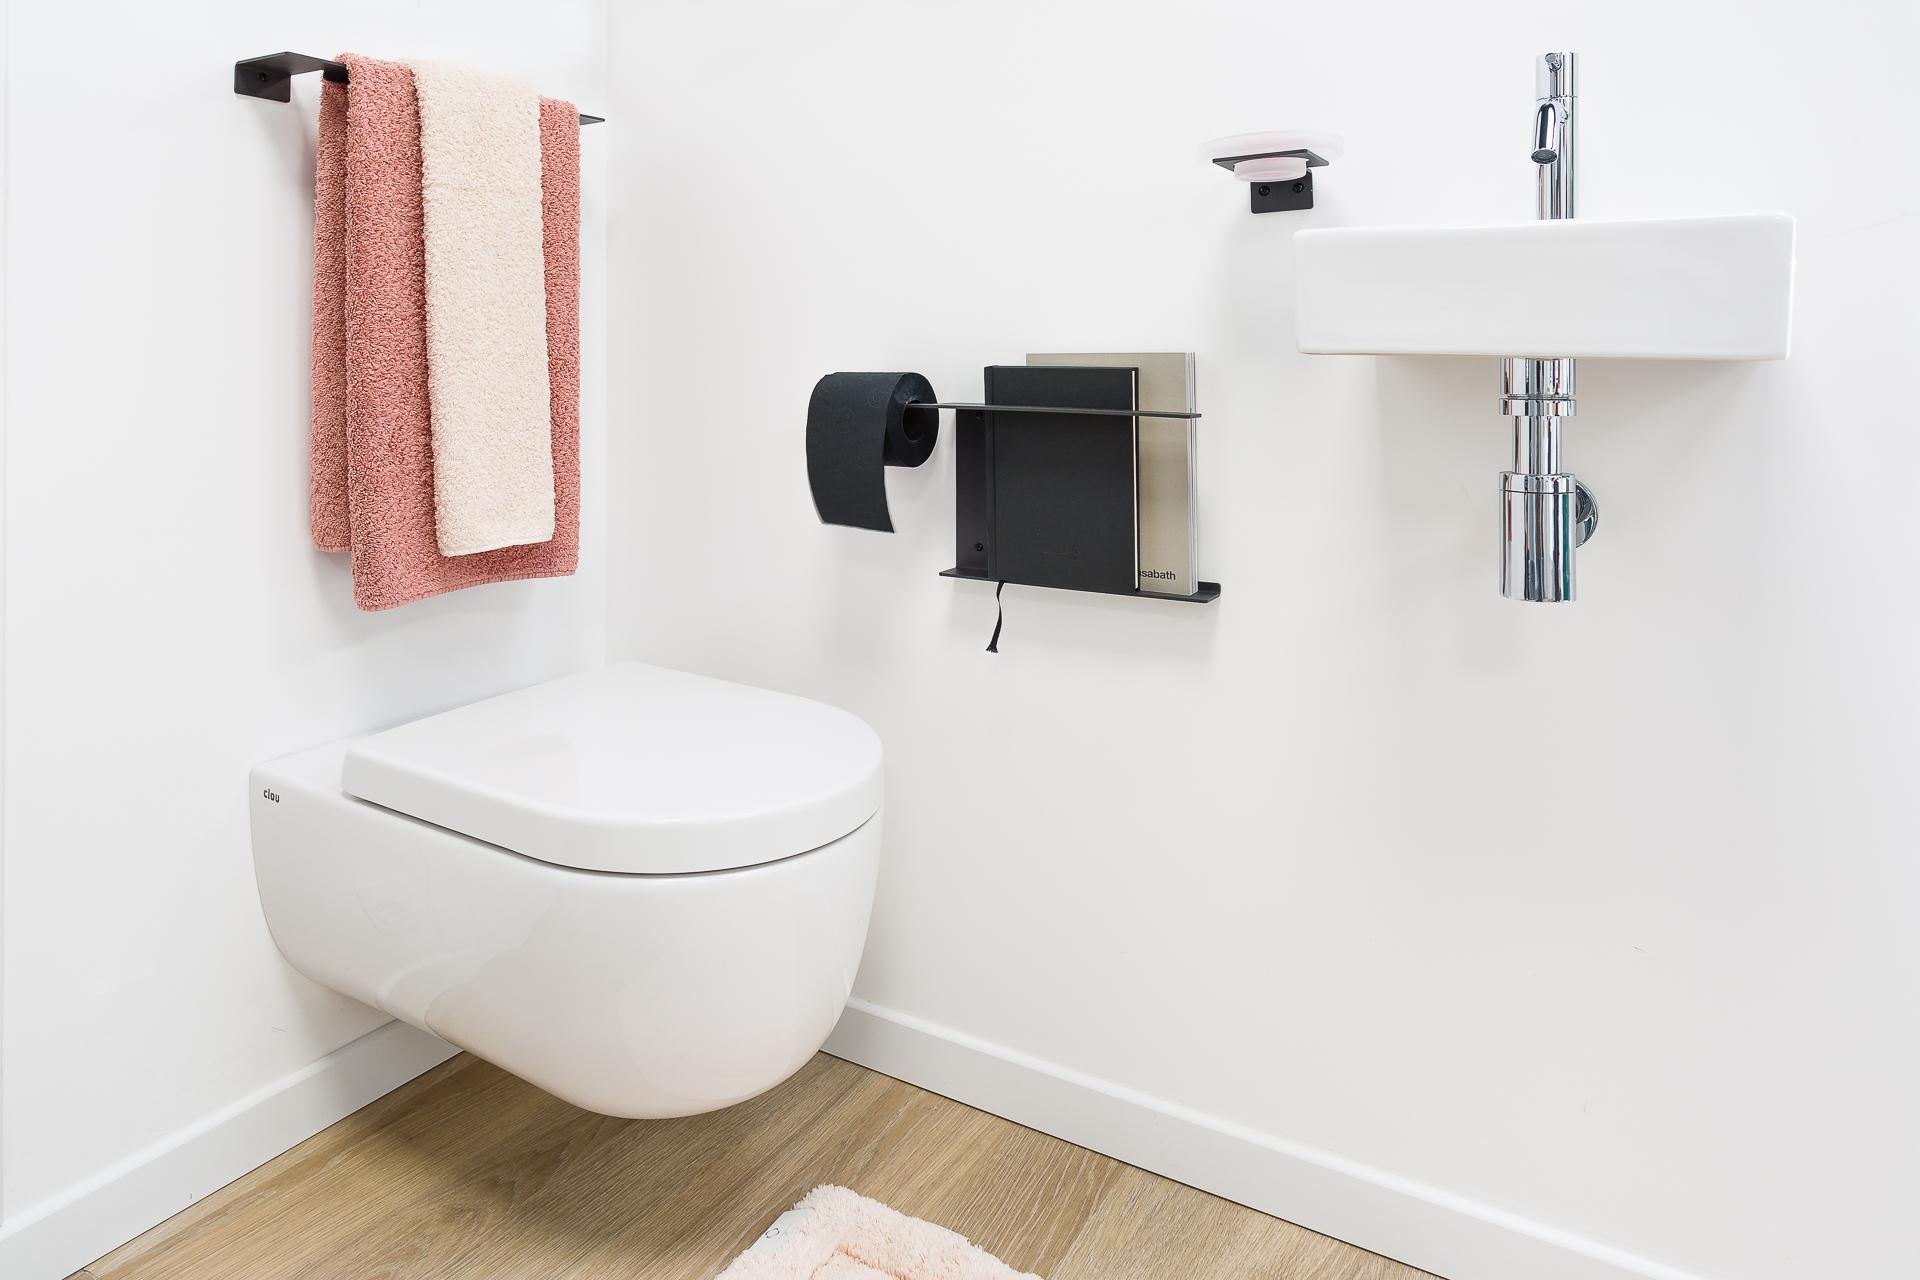 wc - toilettes